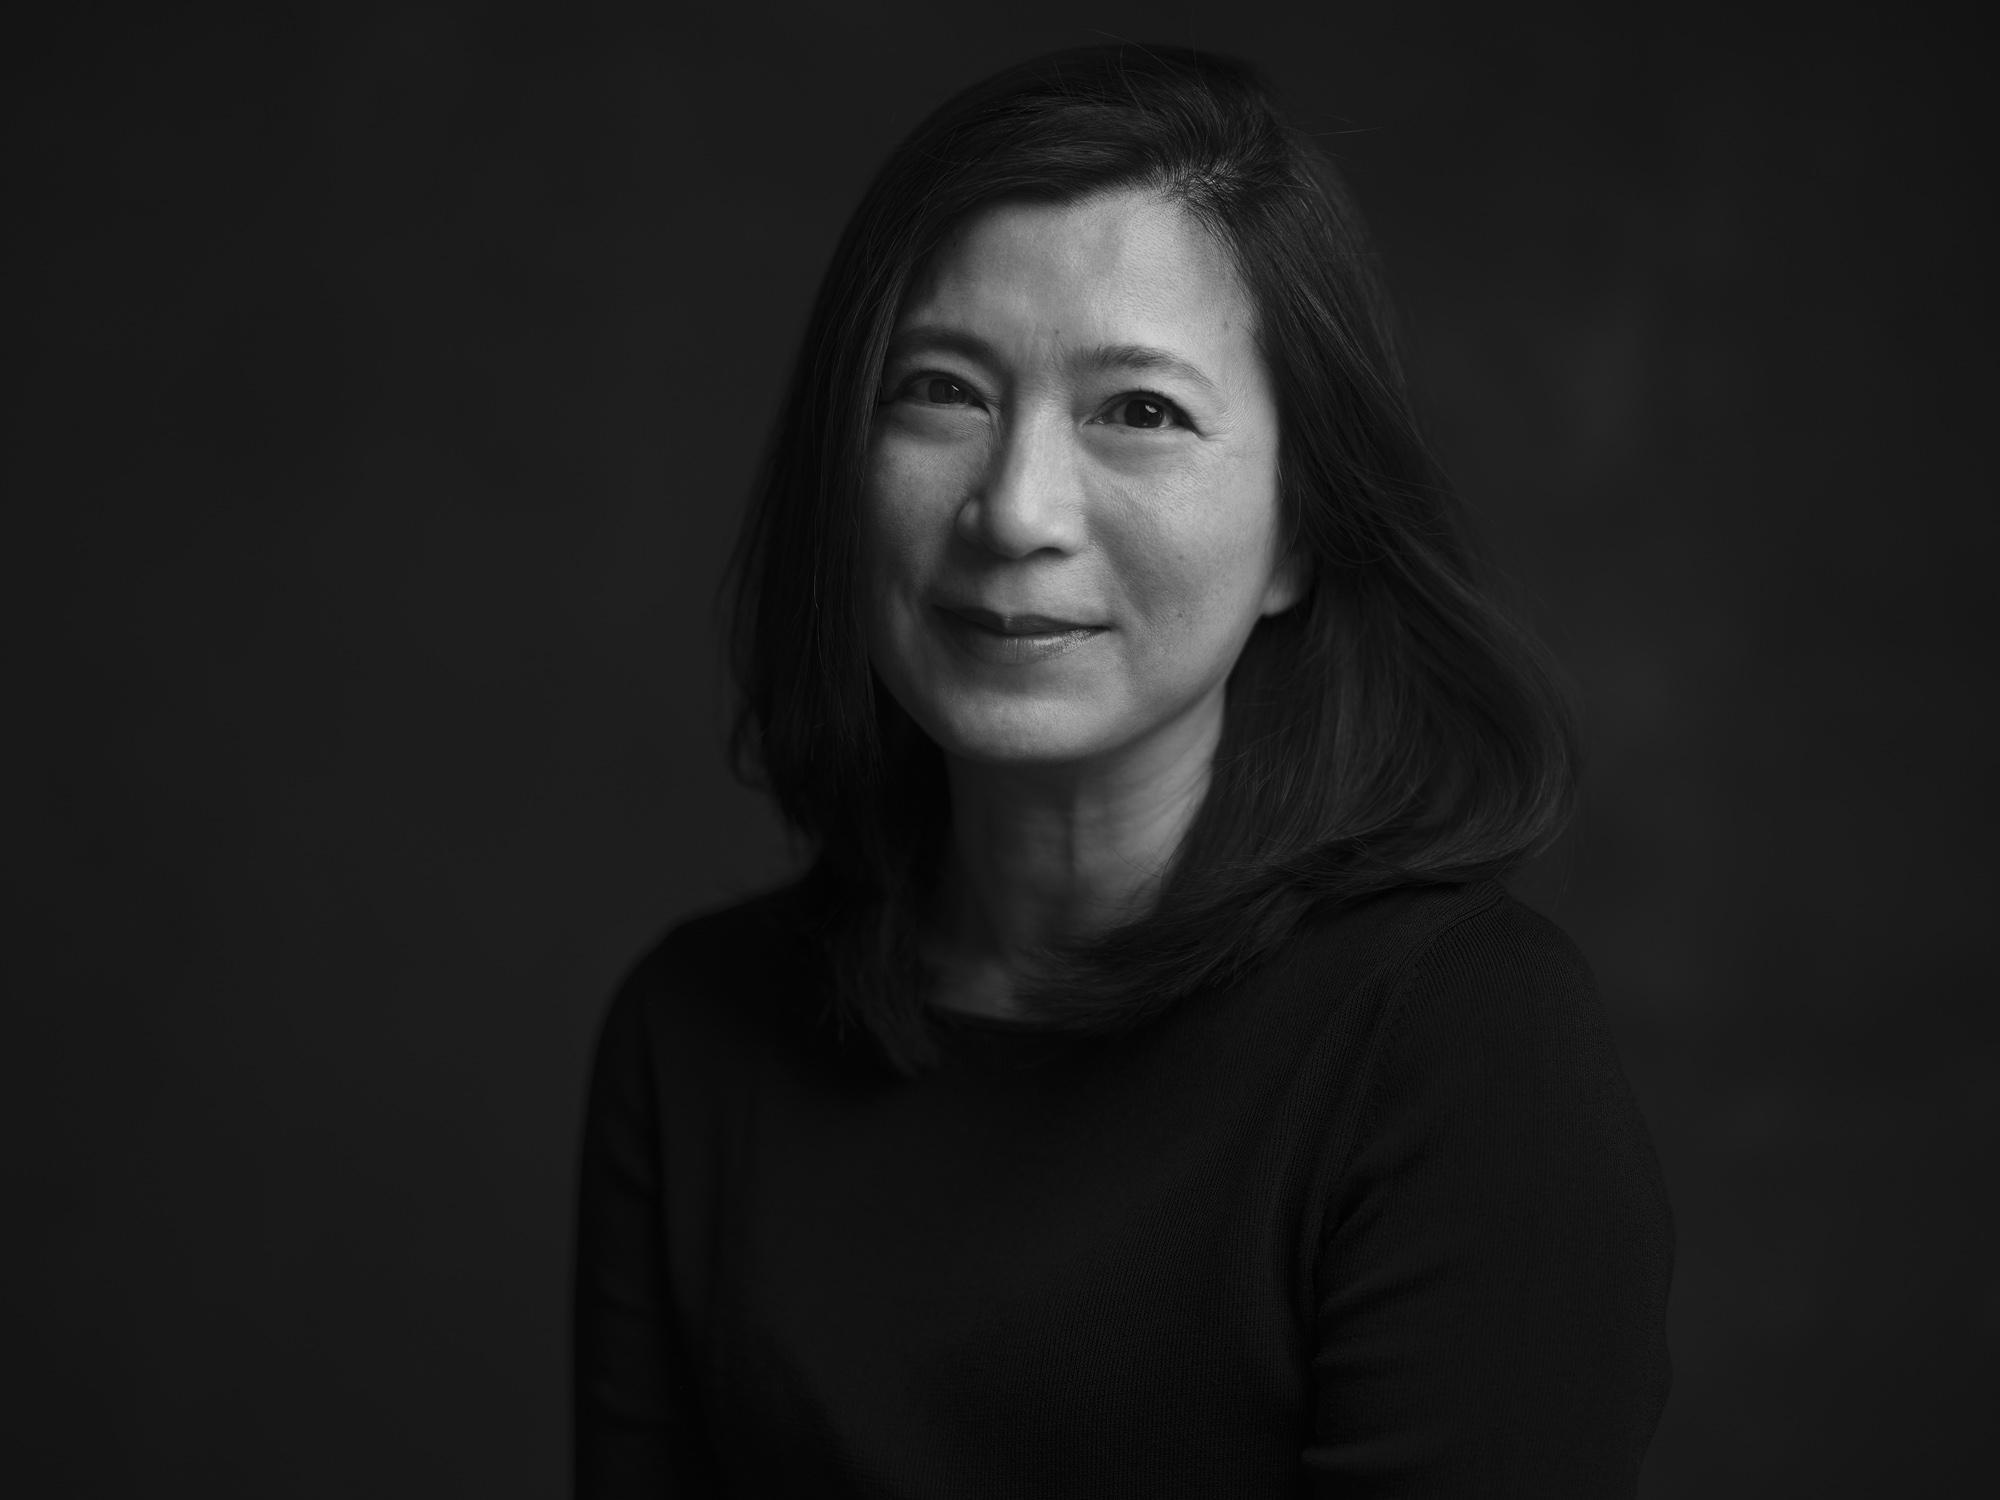 Black and White Portrait Photography Headshot Photographer Singapore COCO Creative Studio 1